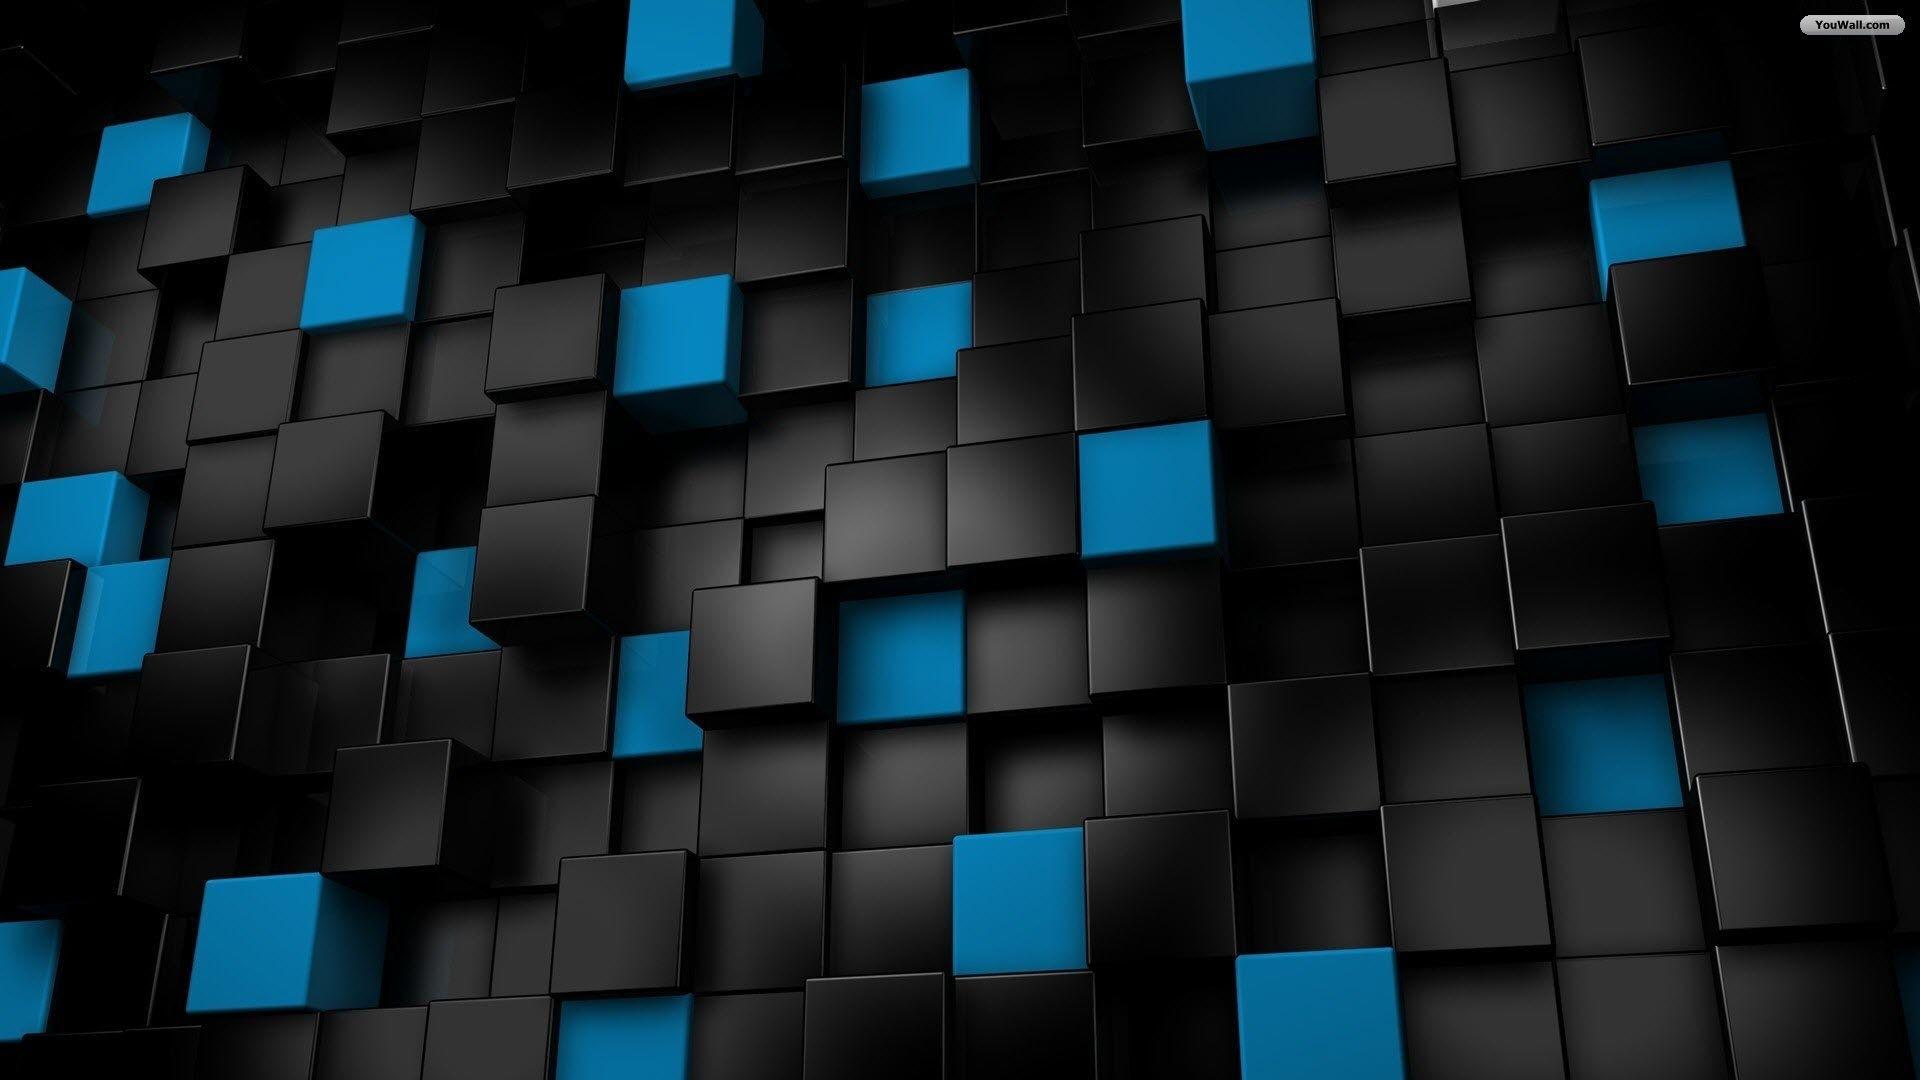 black and blue wallpaper 999 | hd desktop background